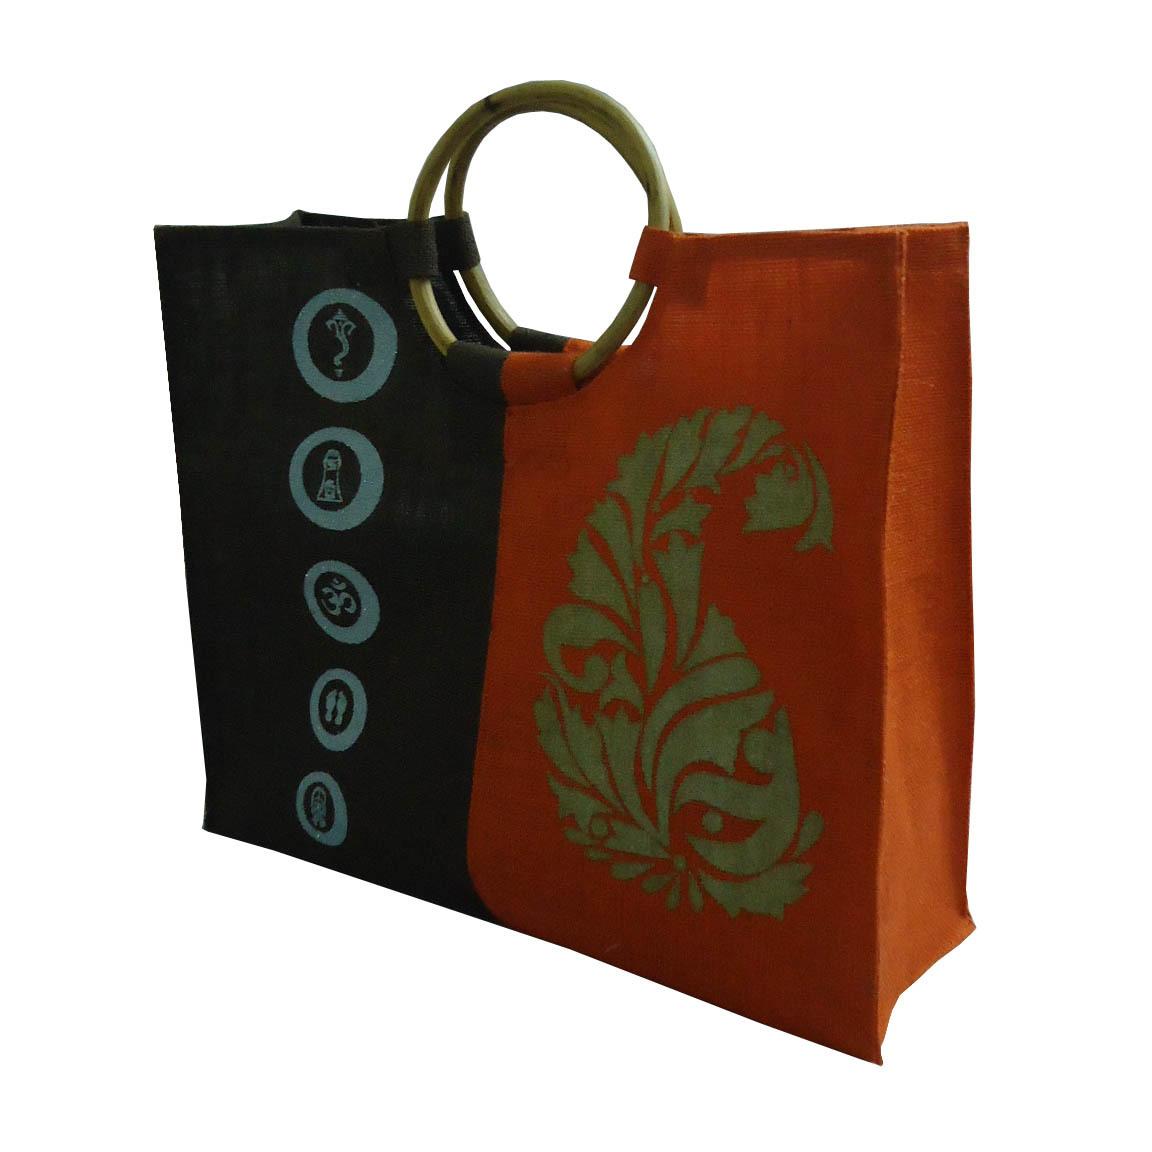 Wooden Cane Round Handle PP Laminated Jute Shopping Bag